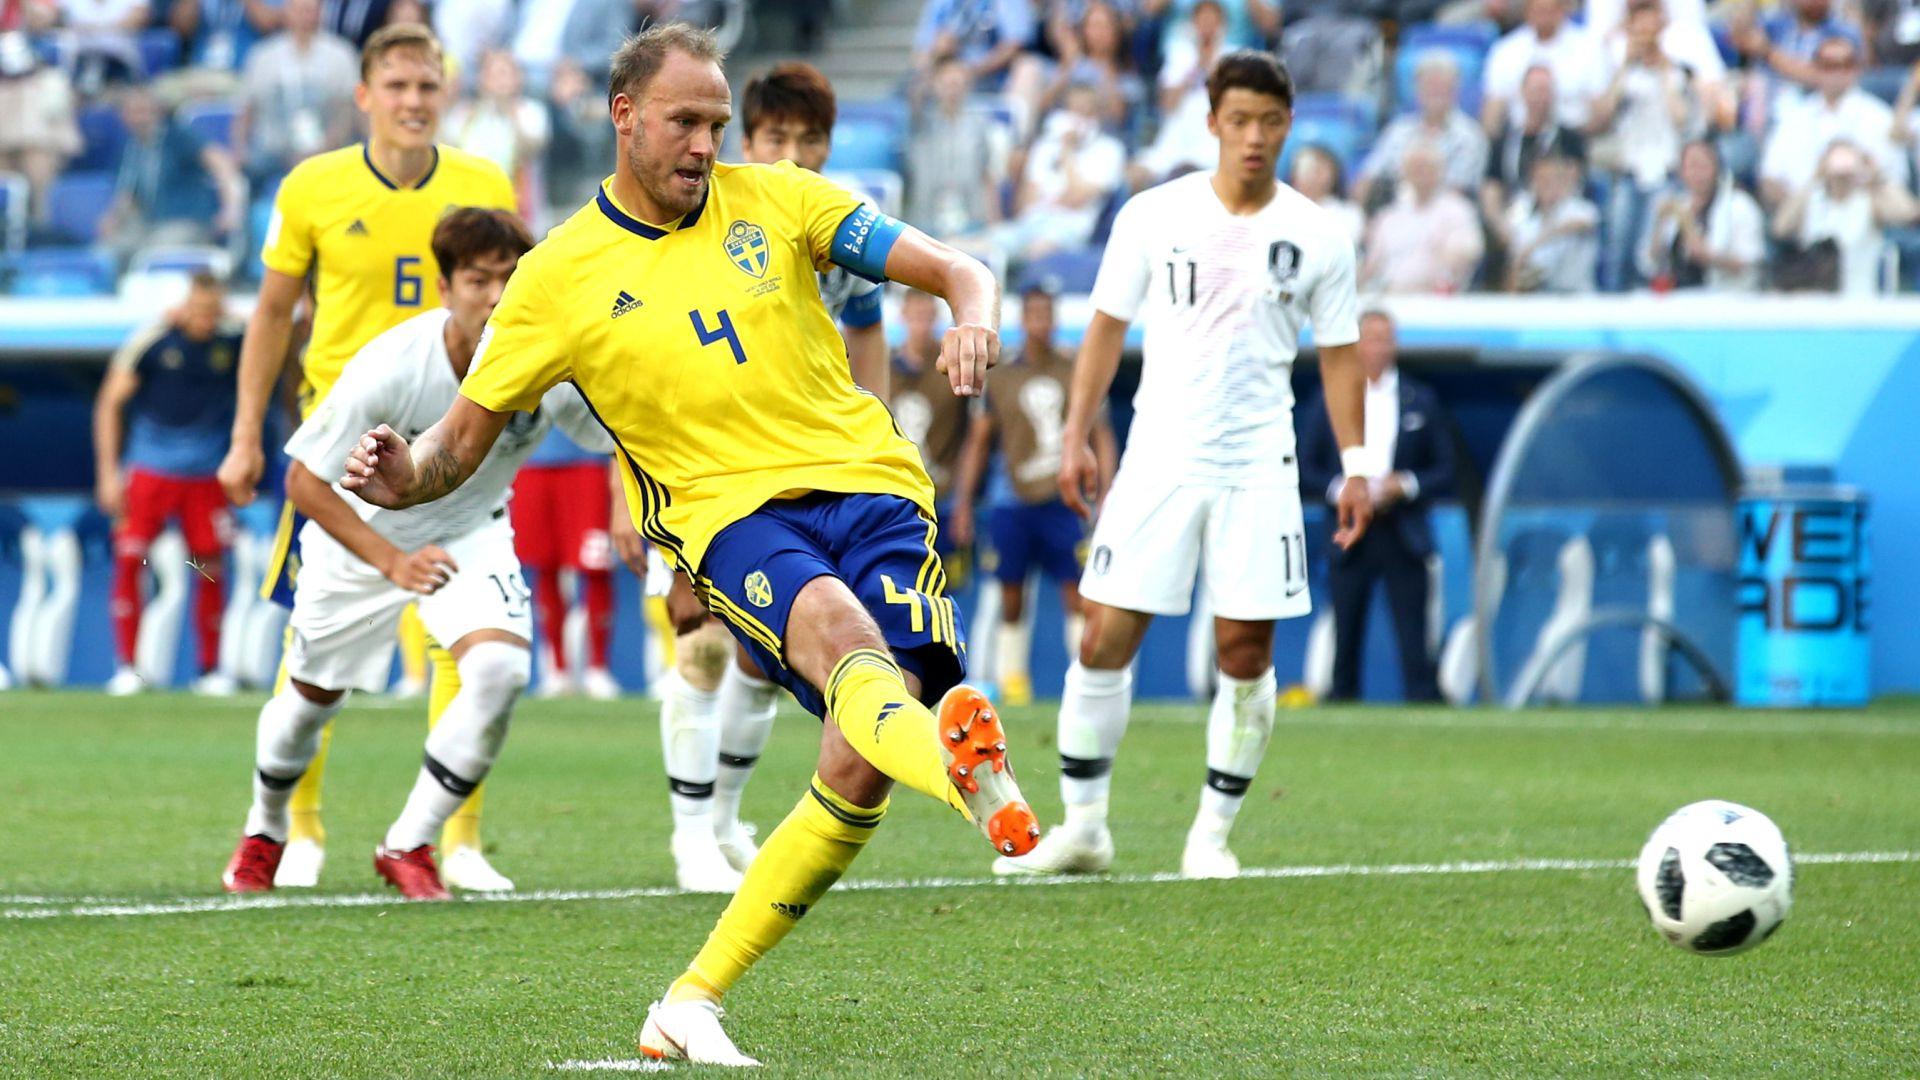 Image result for เปิดสถิติสุดง่วง สวีเดนเฉือนเกาหลีใต้ 1-0